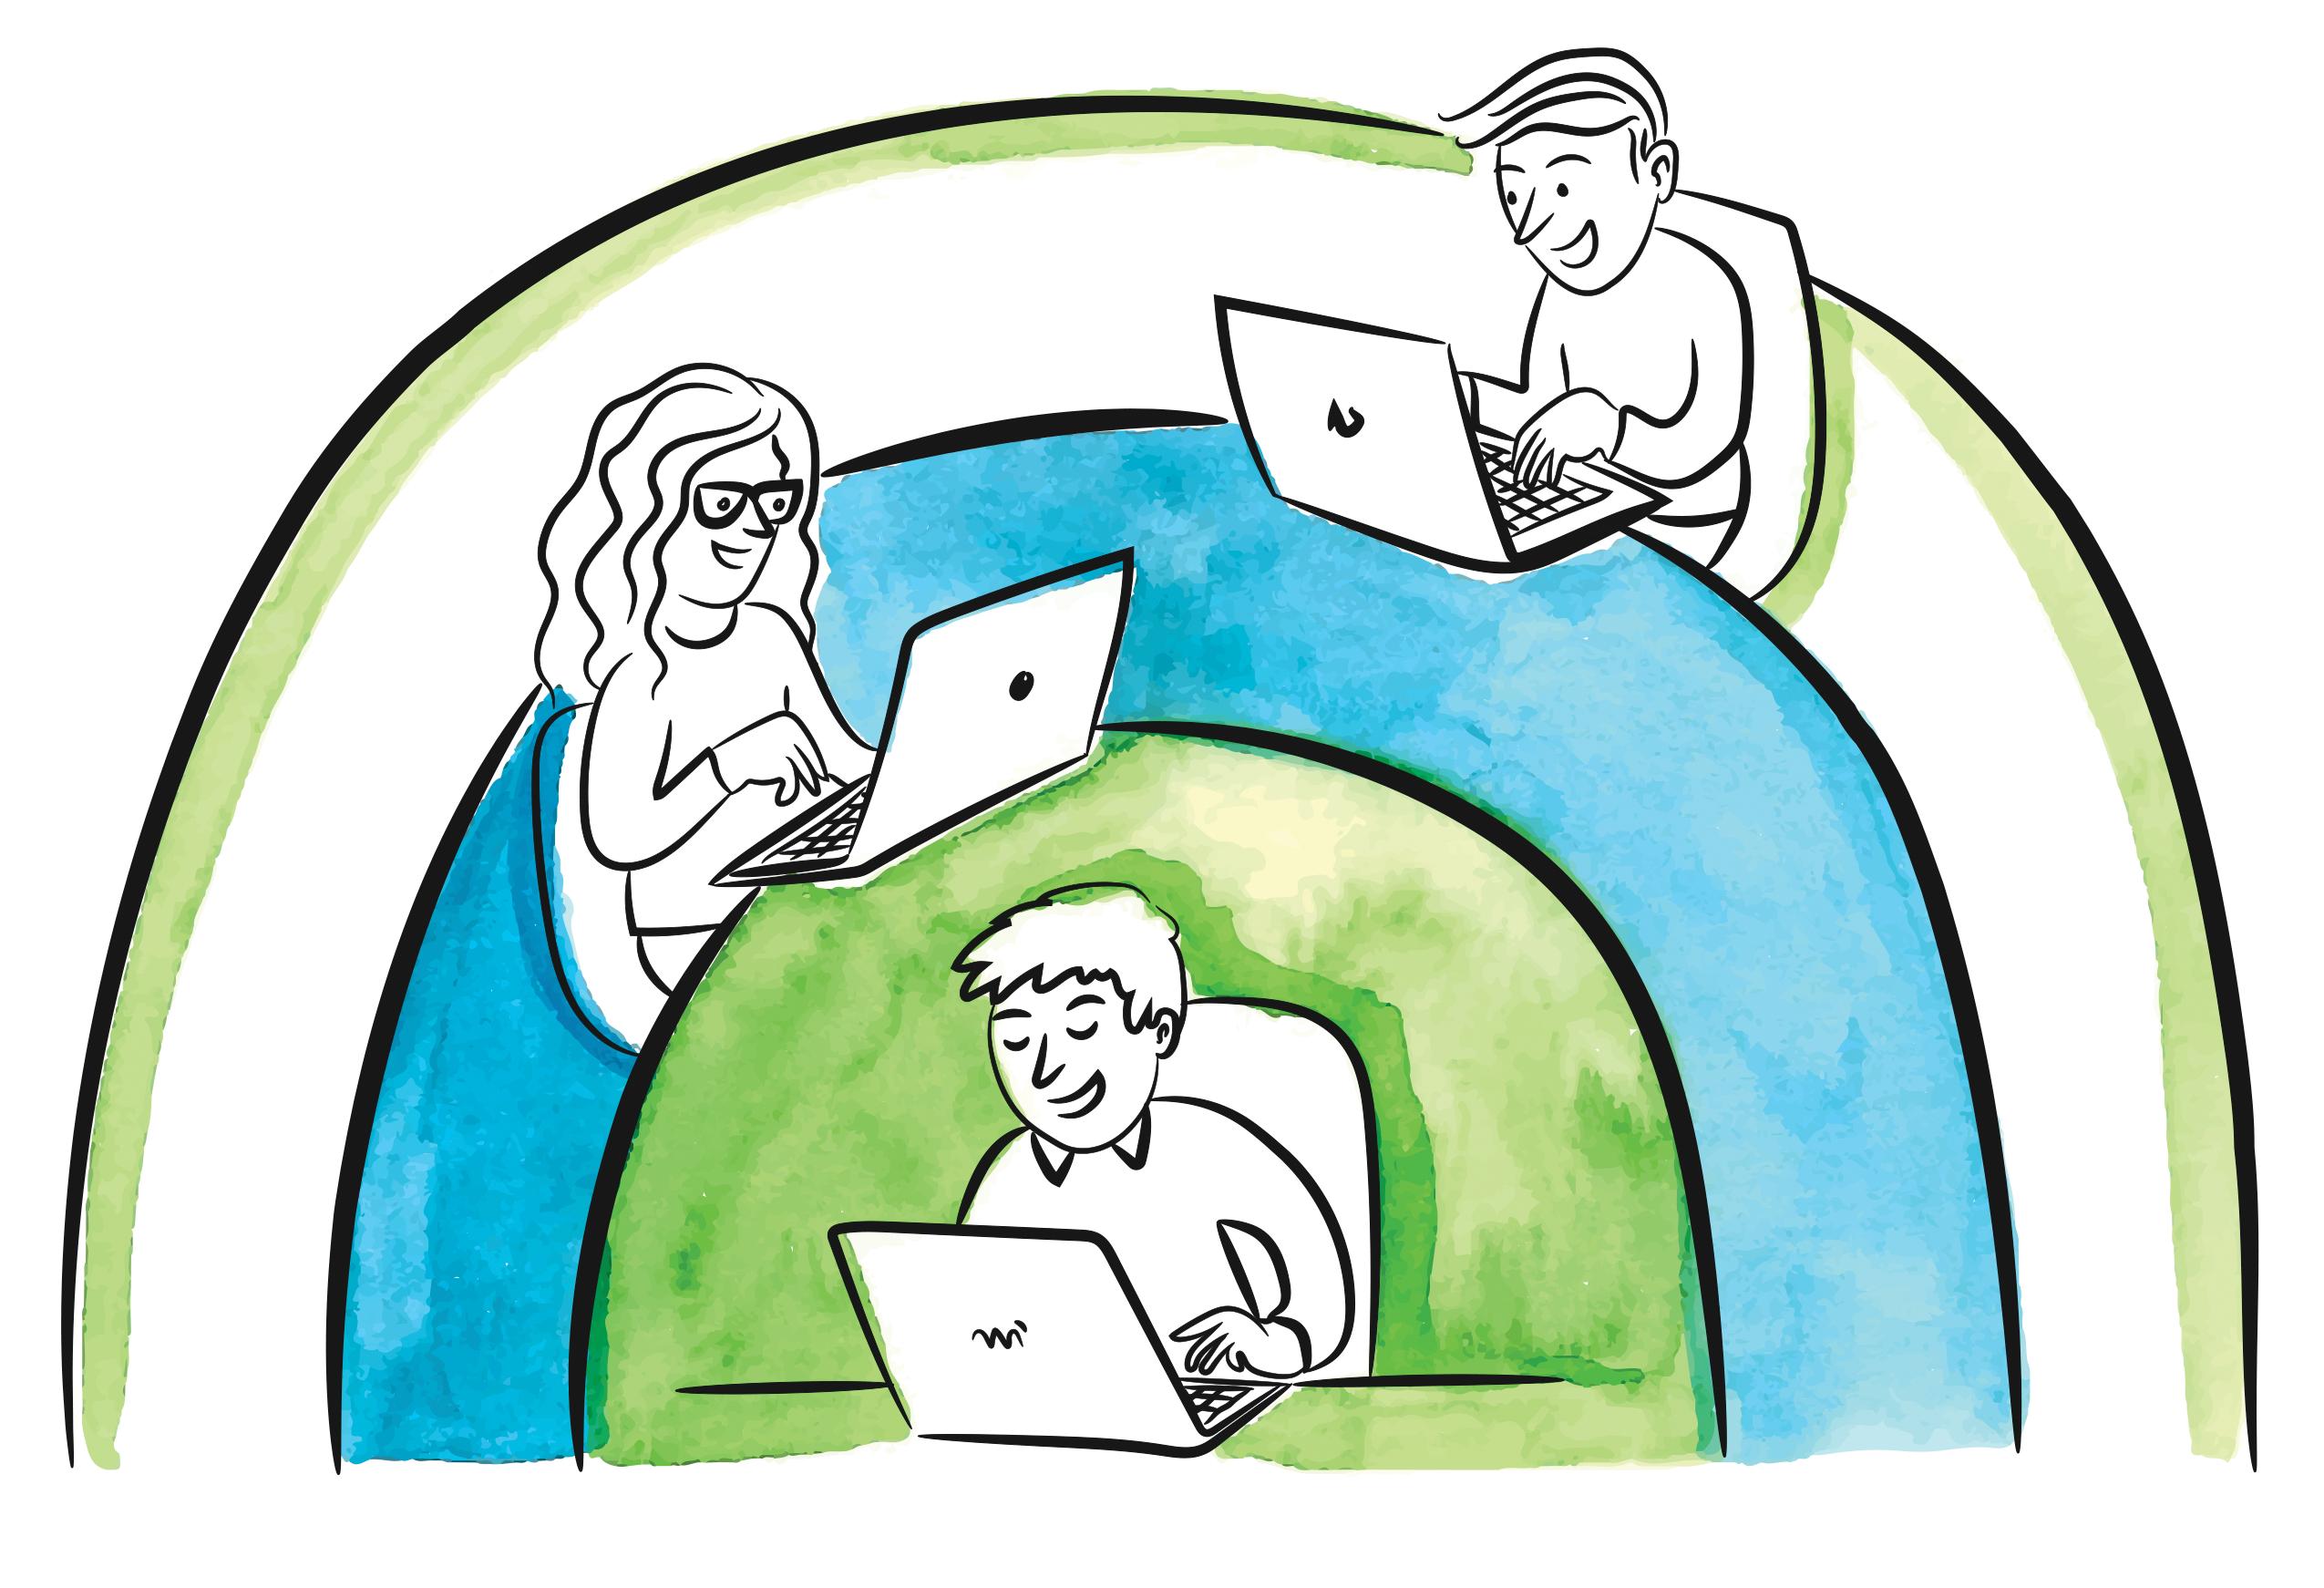 three people working in separate spaces